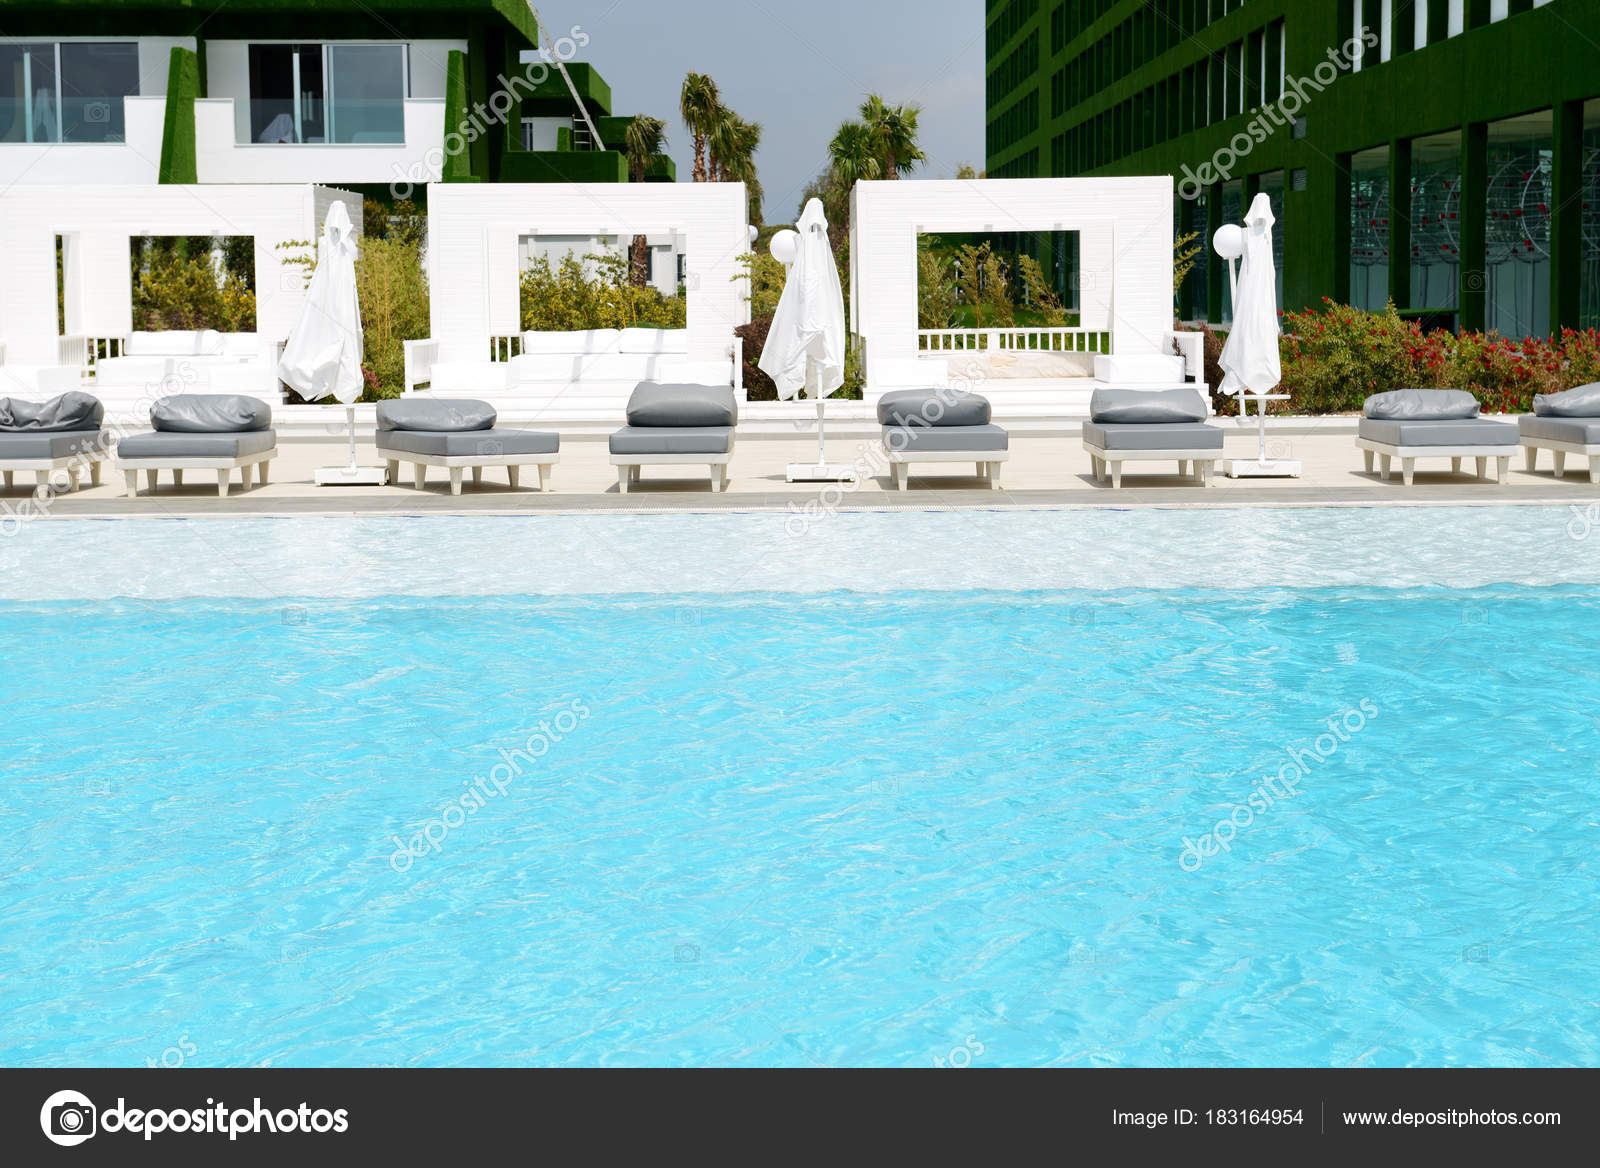 The Swimming Pool At Modern Luxury Hotel Antalya Turkey Stock